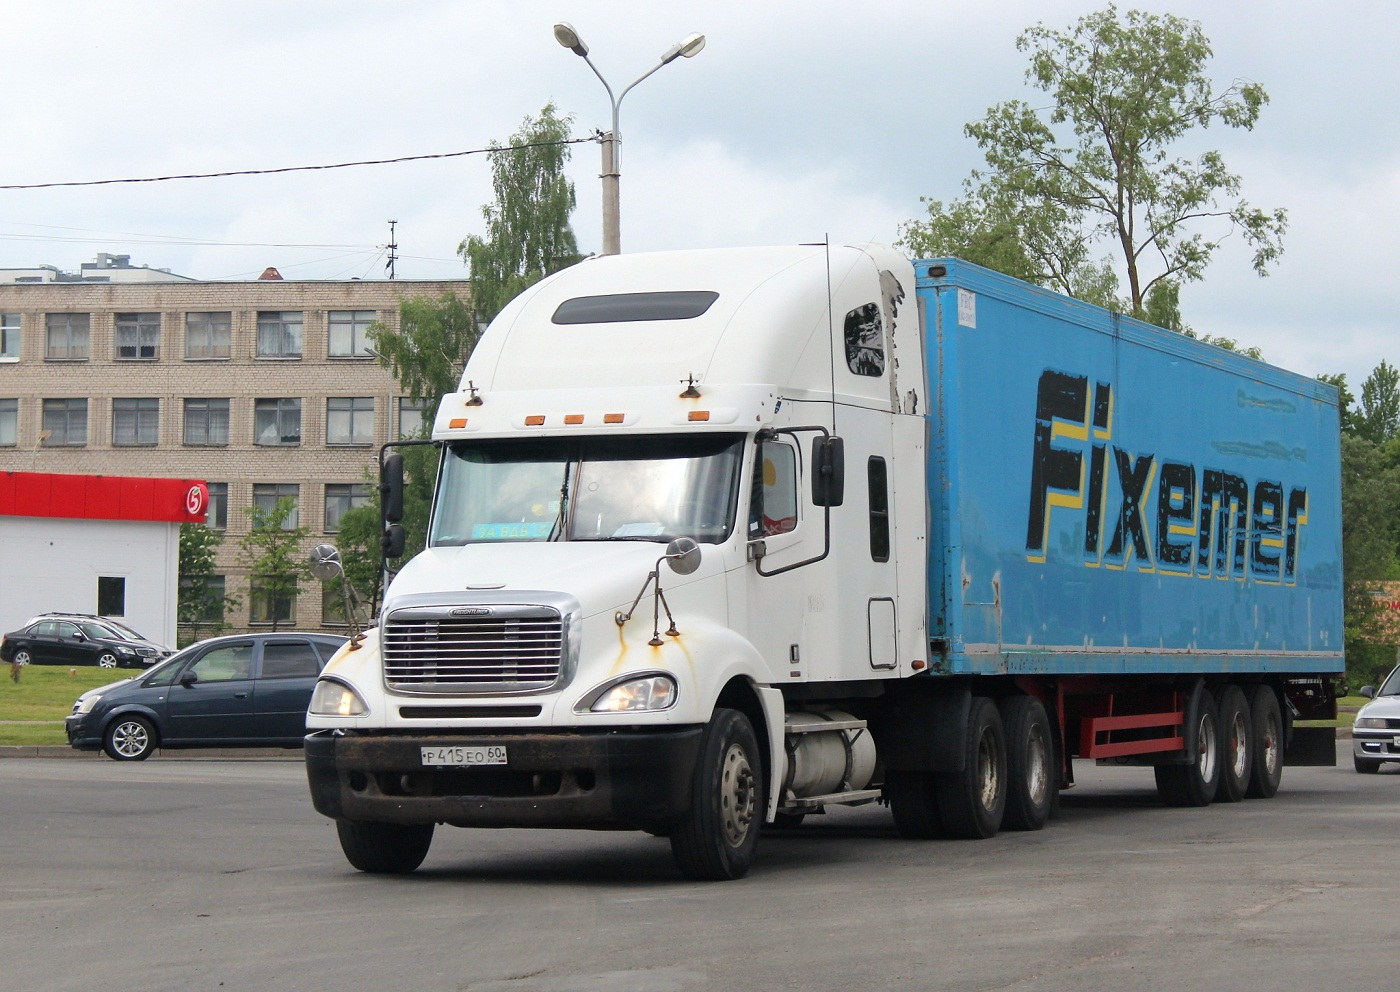 Freightliner Columbia #Р 415 ЕО 60. Псков, улица Леона Поземского